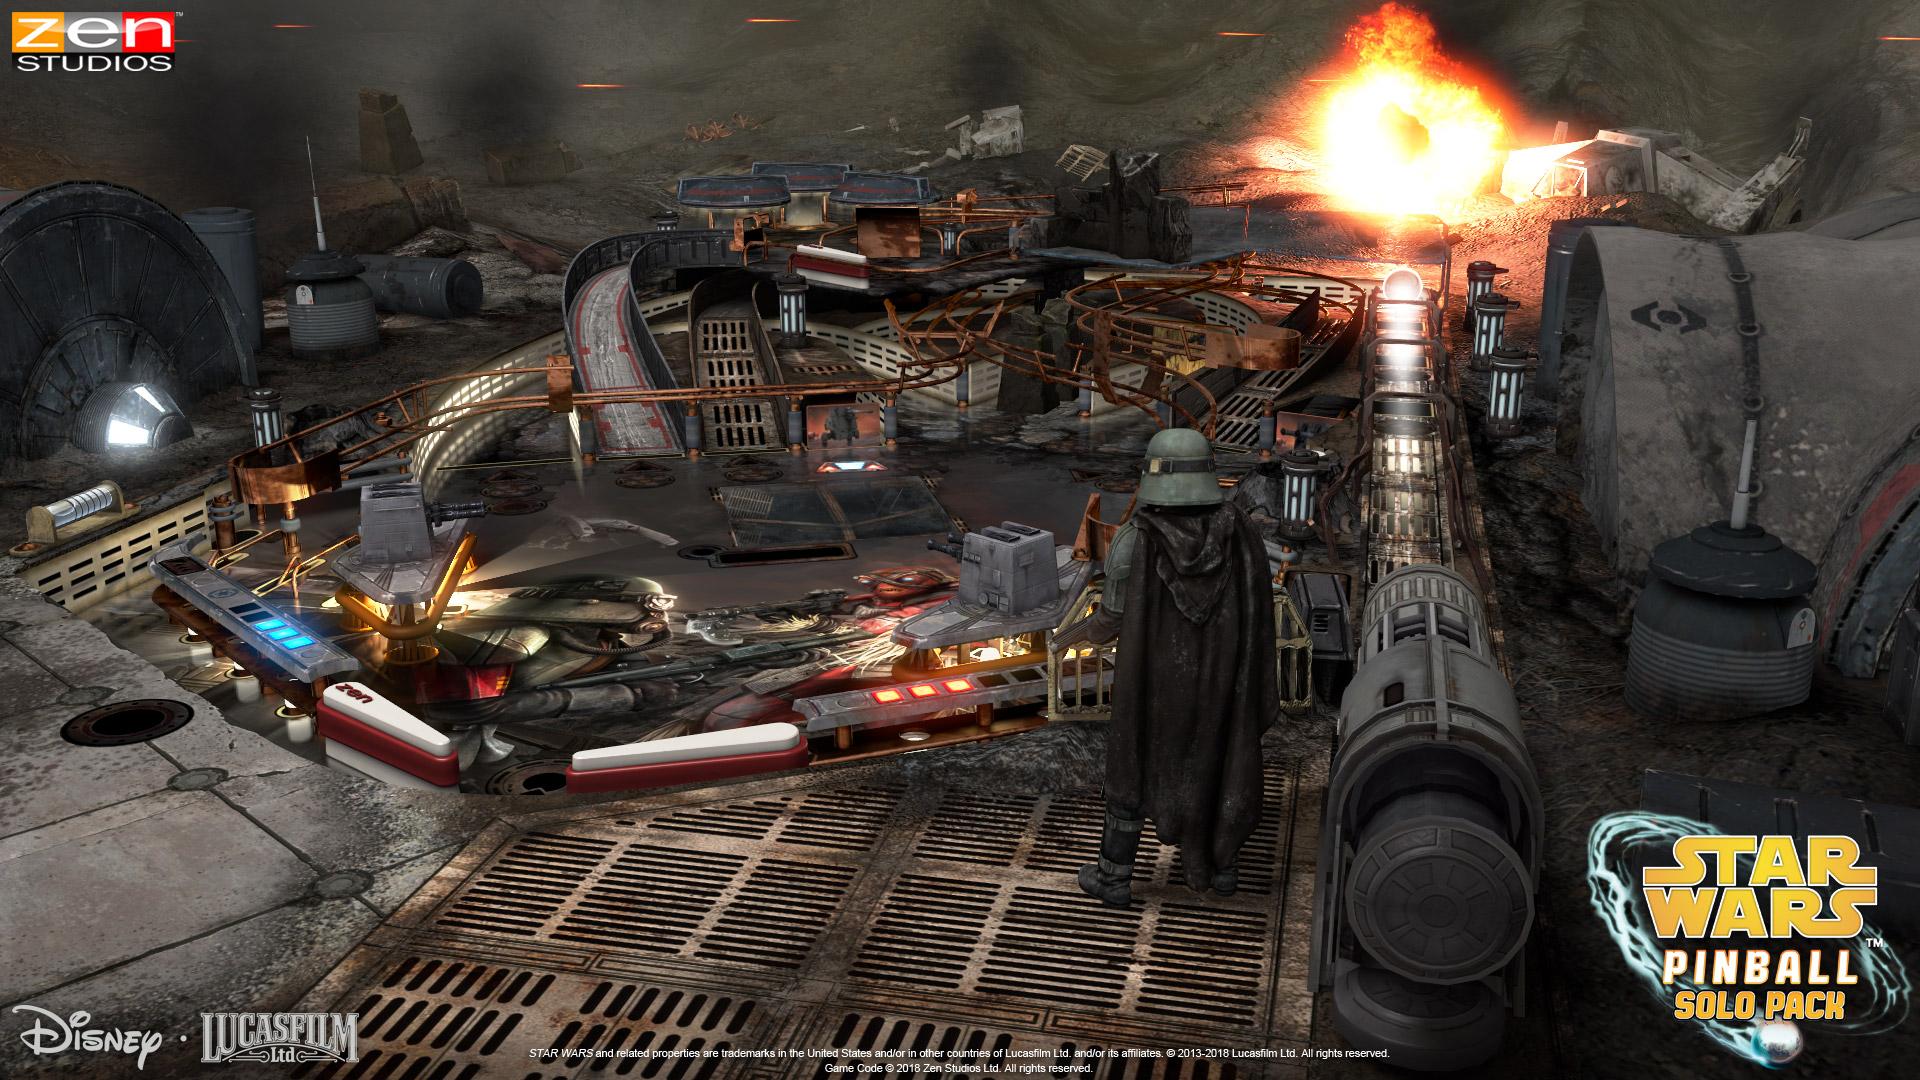 Star wars galaxy of heroes game apk download | Star Wars